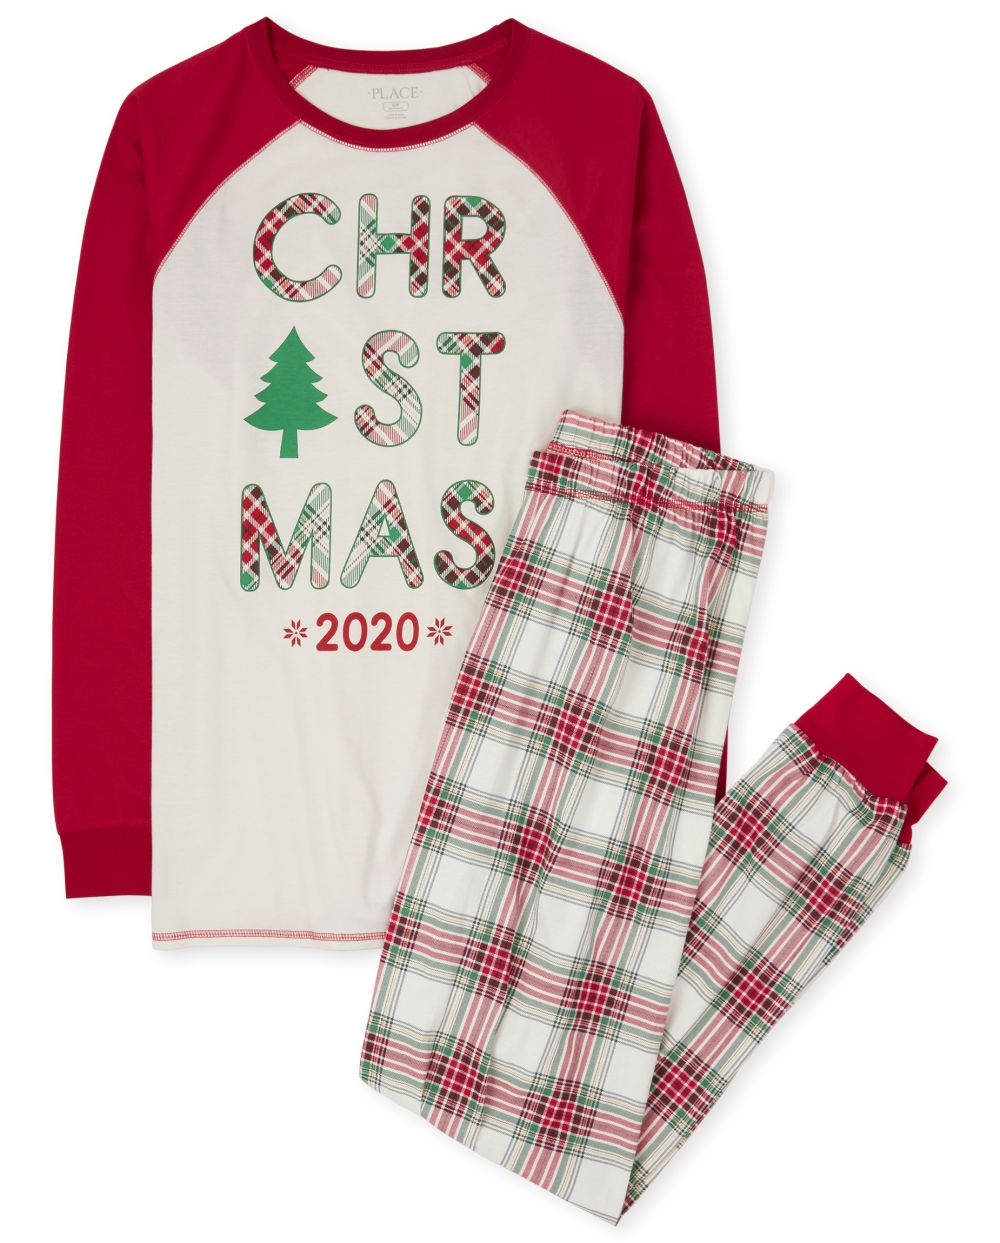 Pijama de algodón de tartán navideño familiar a juego unisex para adultos